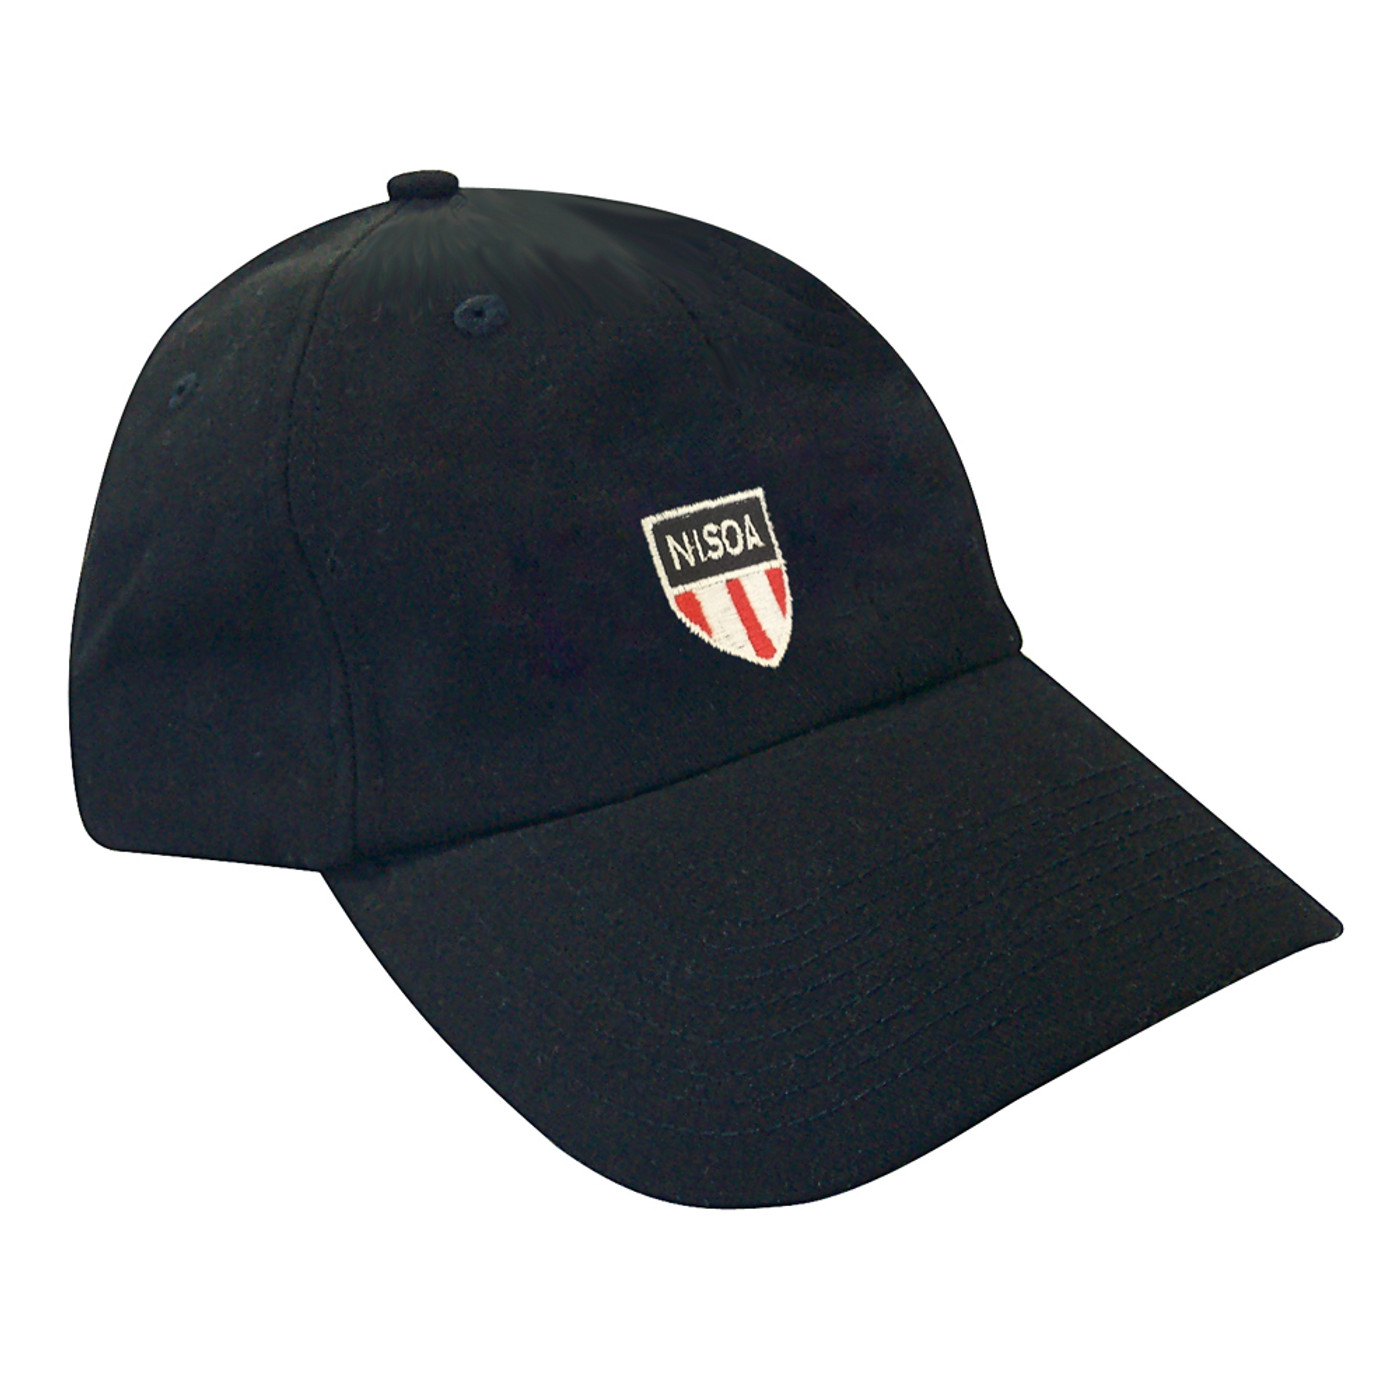 3024N Black Low Fit NISOA Cap